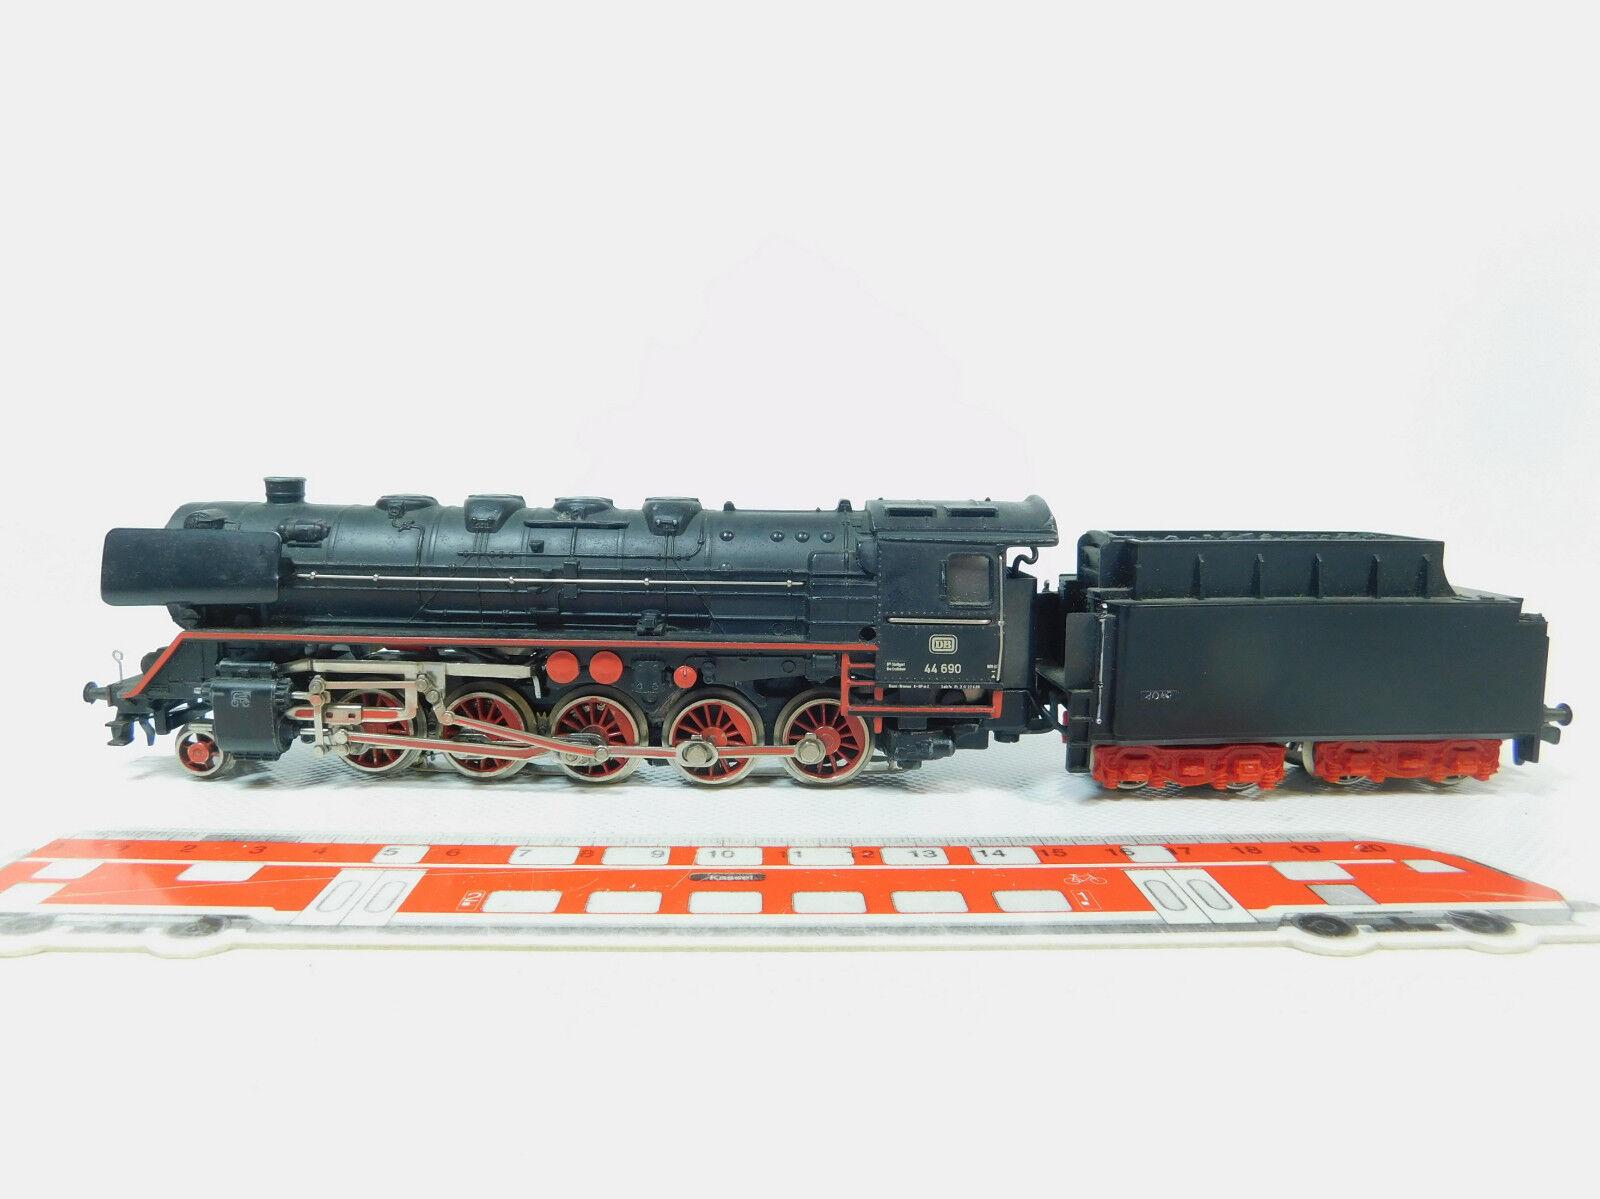 Bl286-3MÄRKLIN H0 AC 3047 guss-dampflokomotive (Without Vapor) 44 690 DB Telex